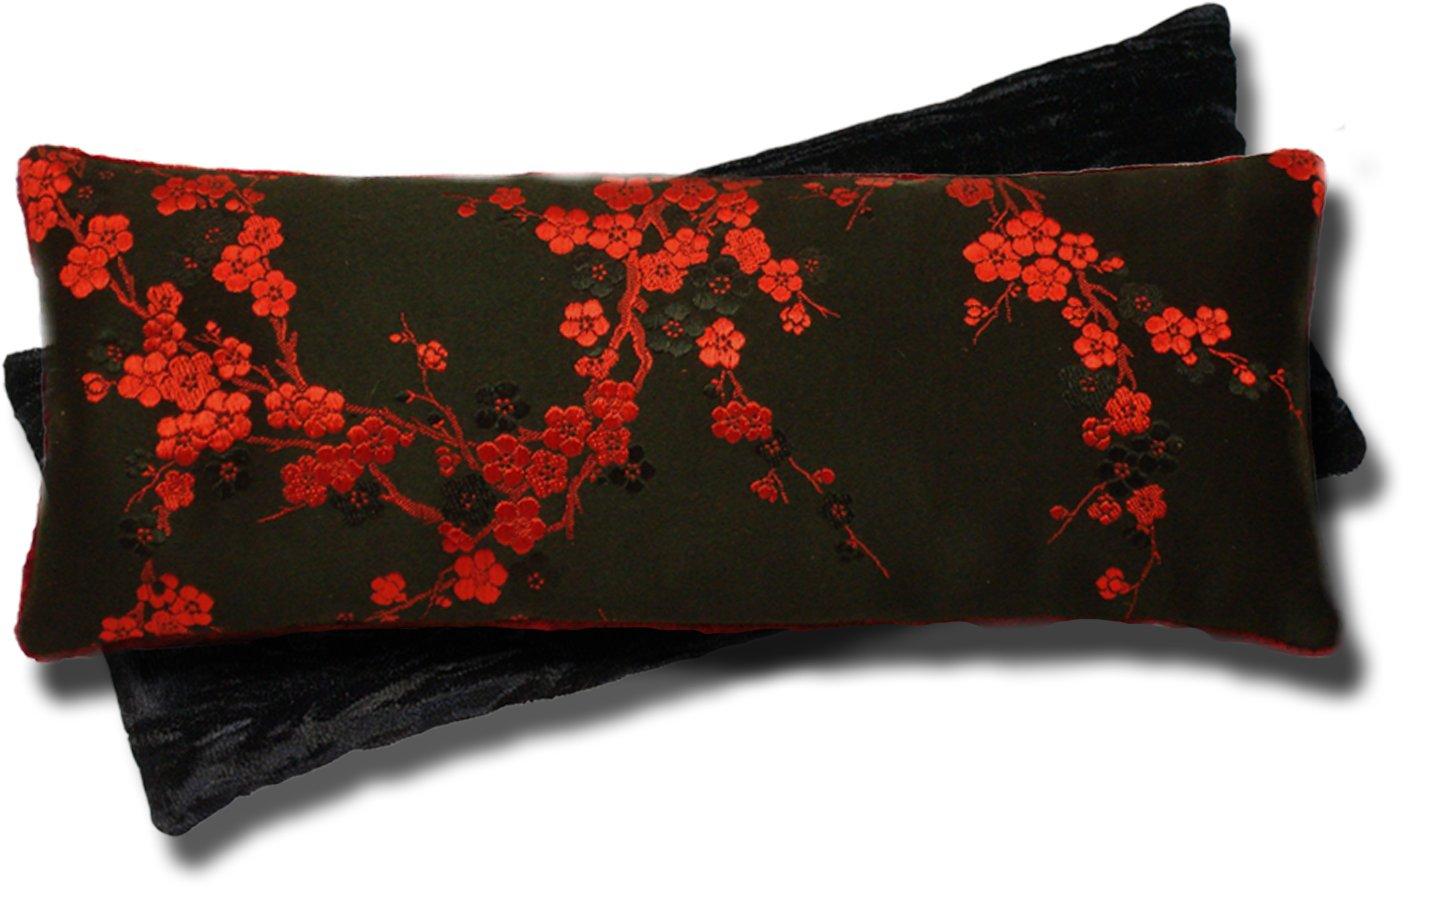 size pillow case walmart cheap mauve mainstay queen silk decorative plum of lavender purple pillowcase cases full amazon sheets scented